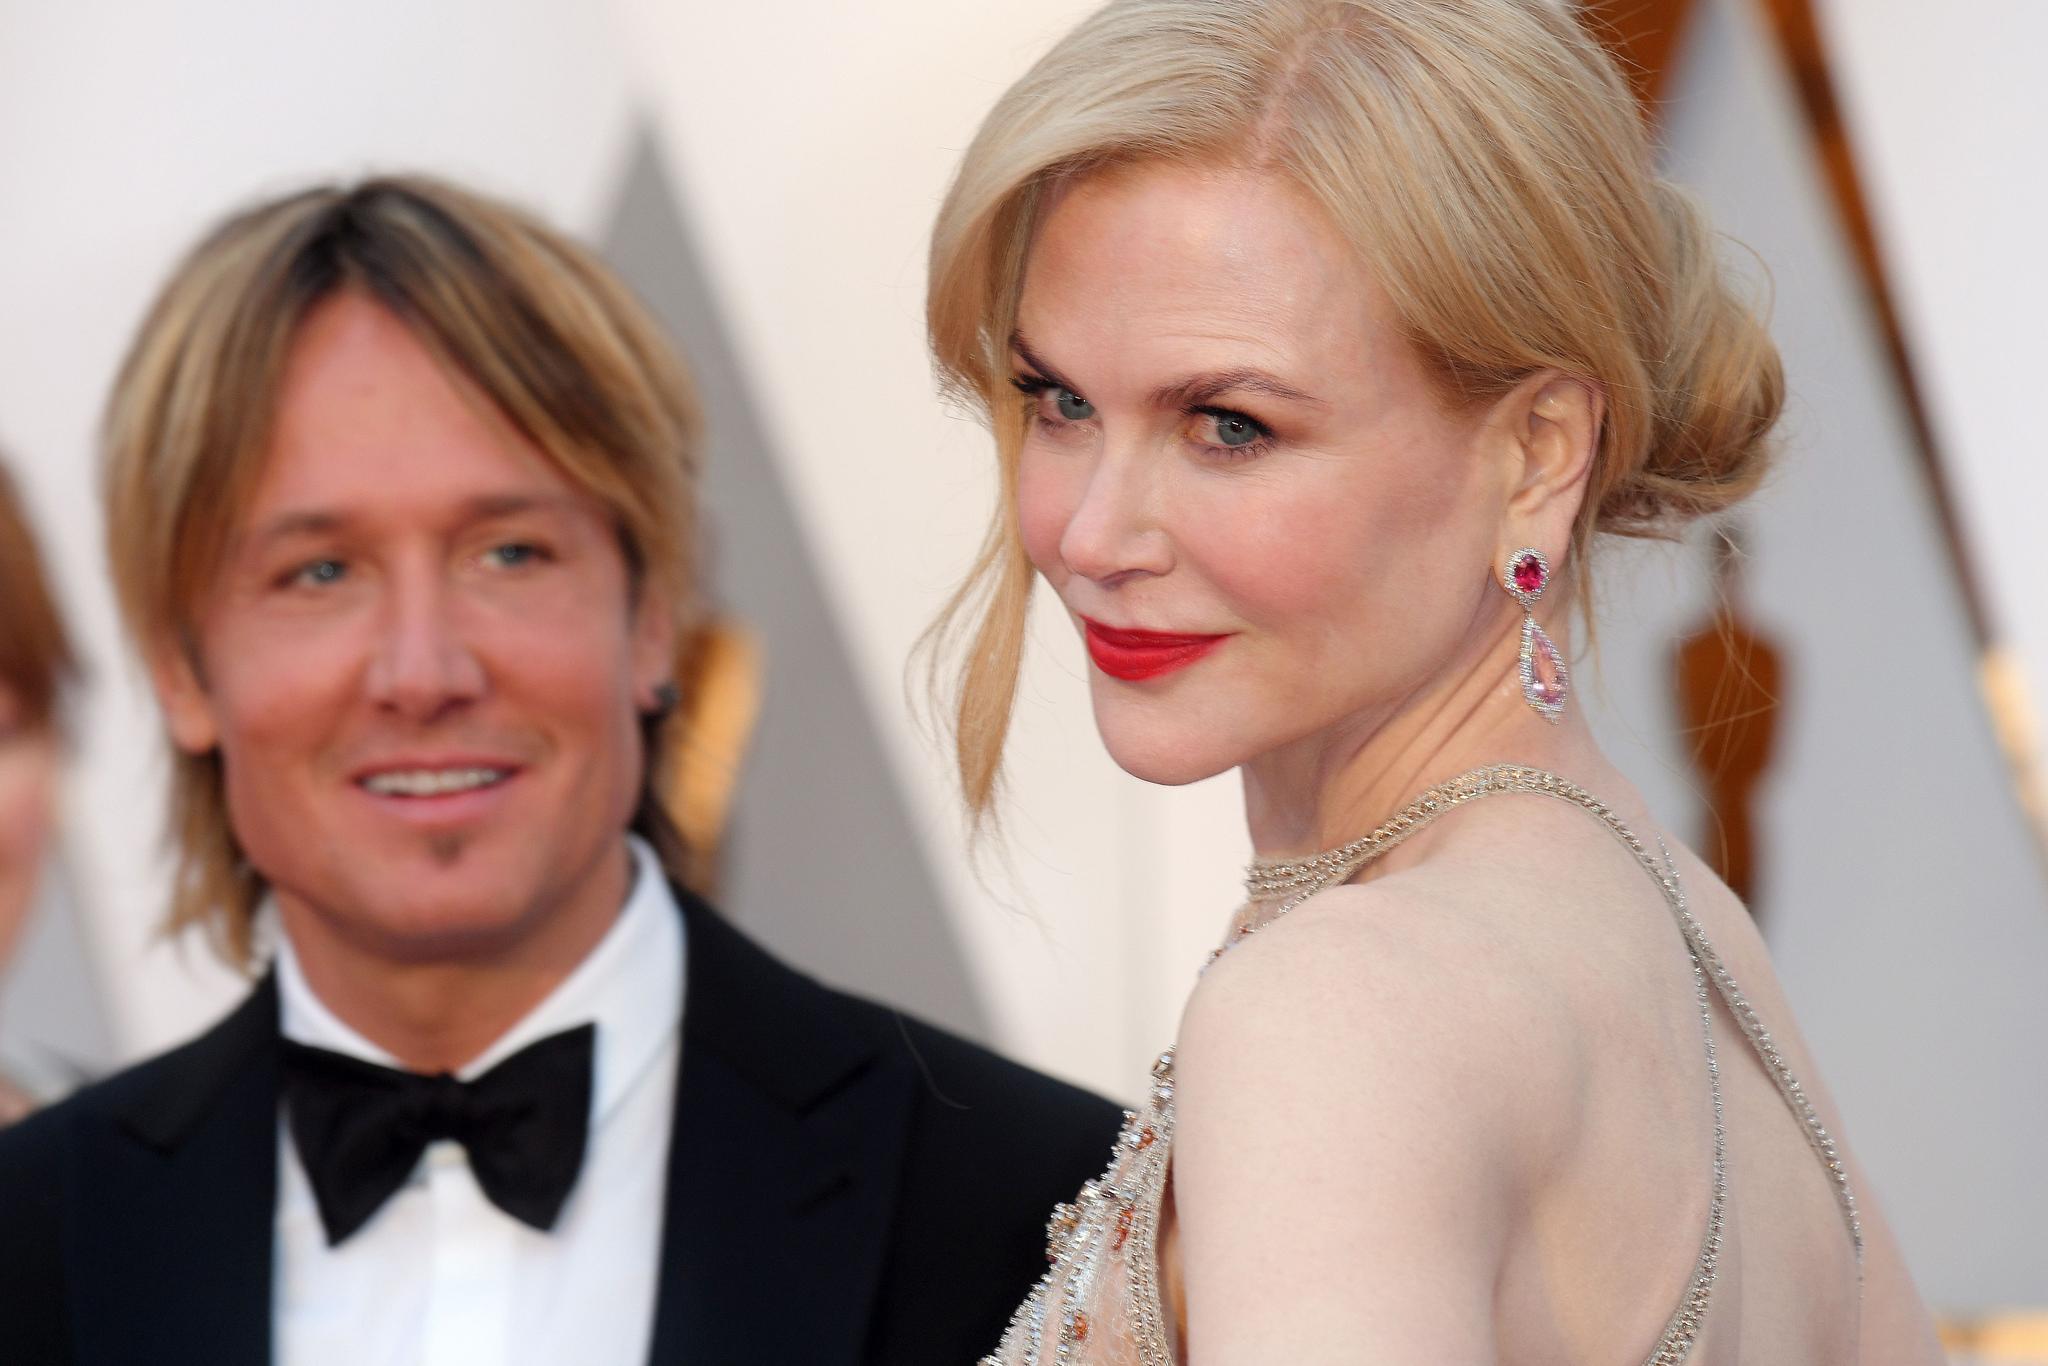 Keith Urban and Nicole Kidman89th Annual Academy Awards, Arrivals, Los Angeles, USA - 26 Feb 2017